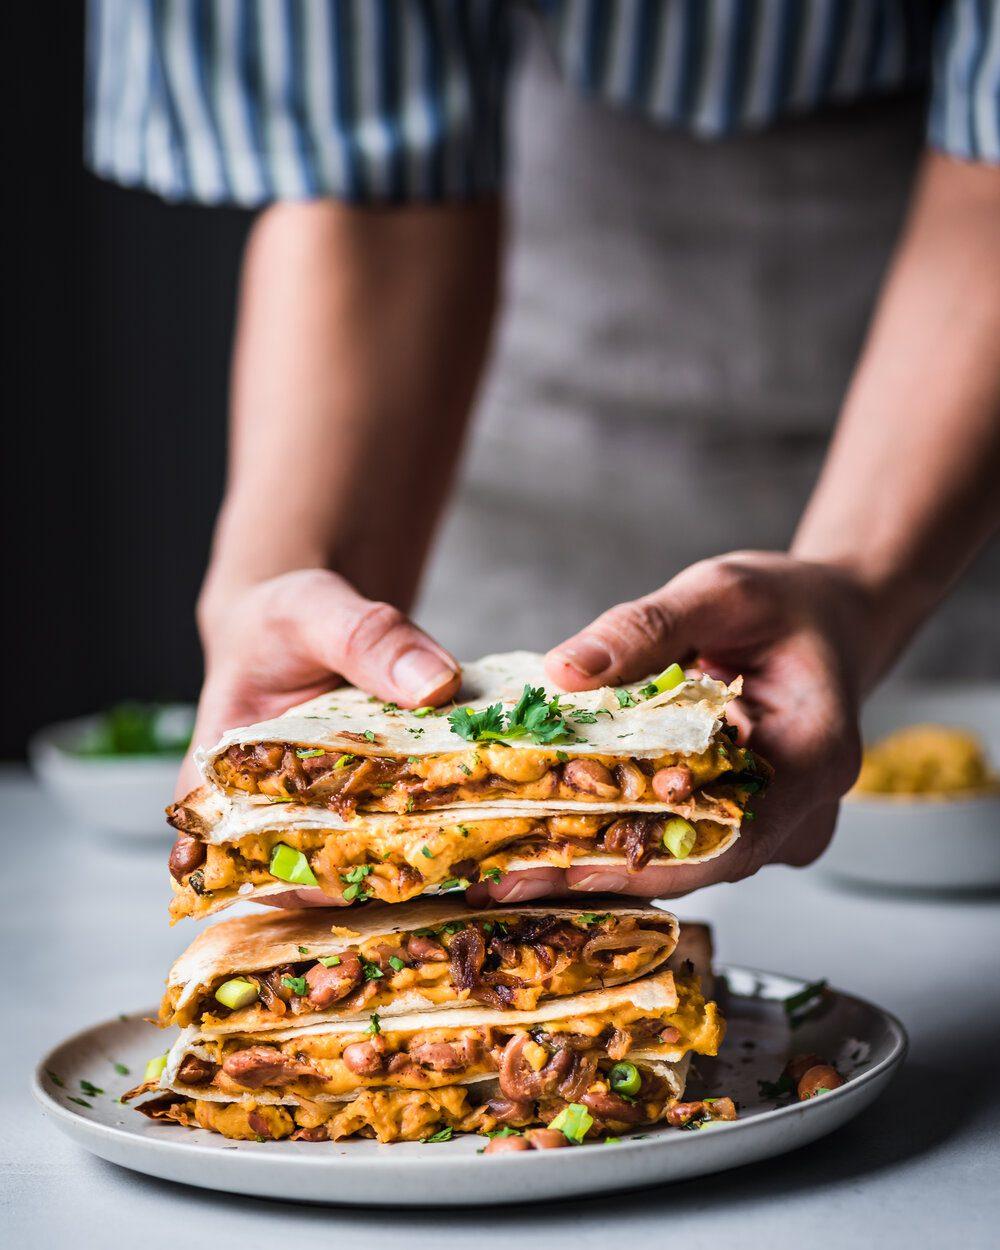 Vegan Quesadillas with Smoky Cheese and Refried Beans. quesadillas food photography. Vegan pantry quesadillas.